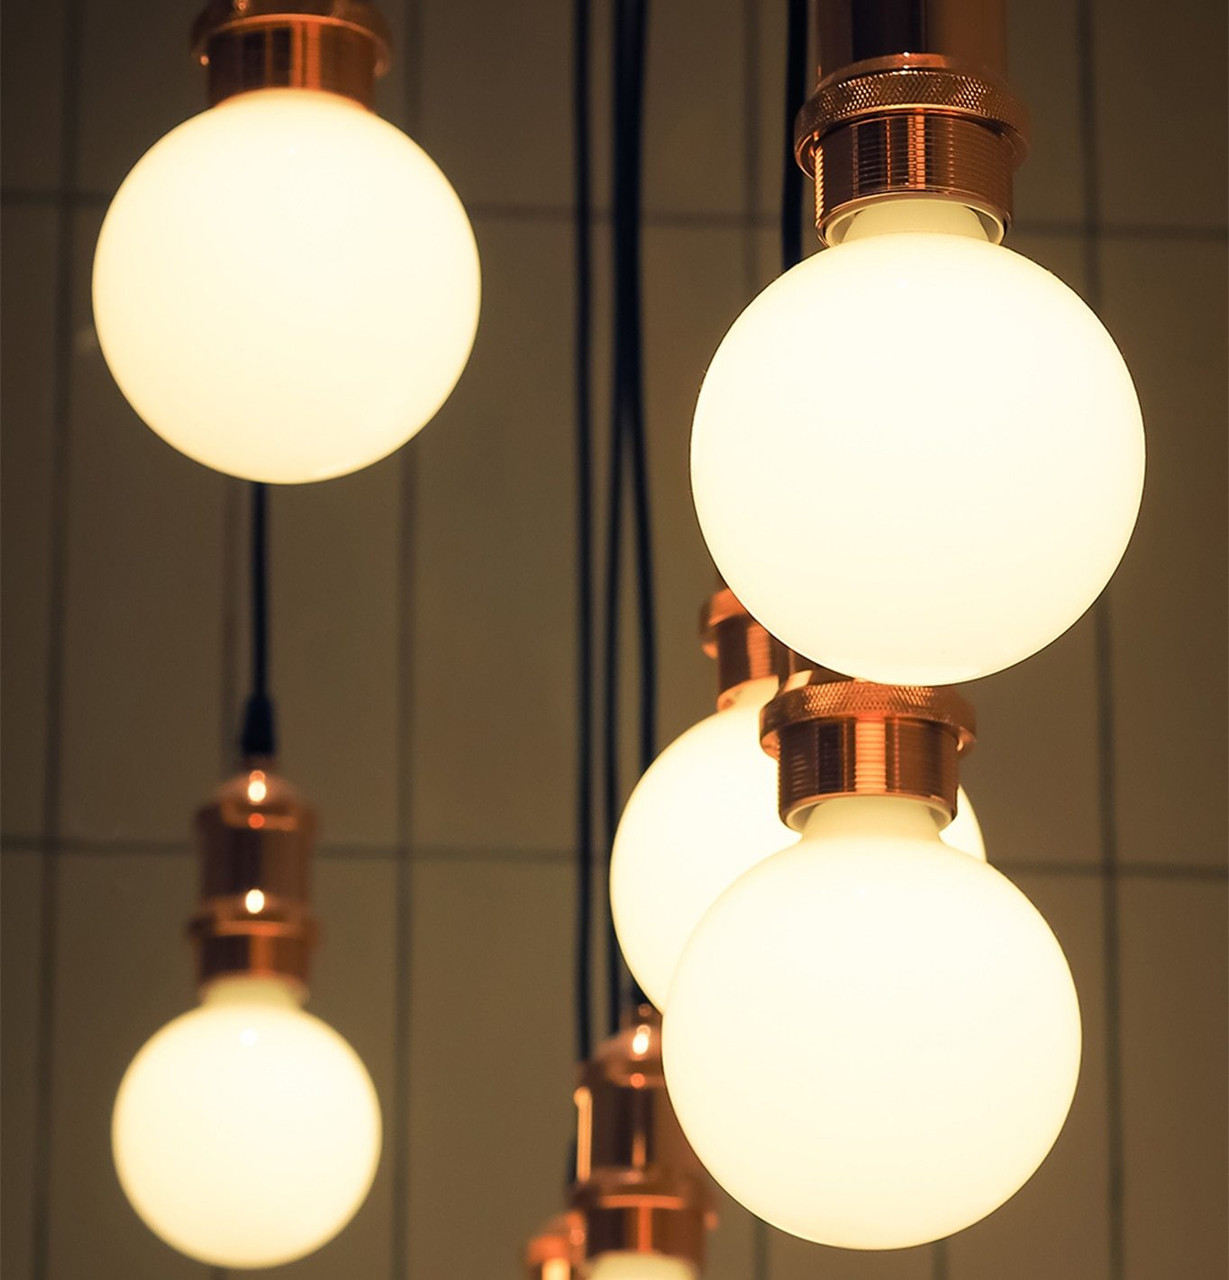 Crompton Lamps LED G125 Antique Bronze Light Bulbs